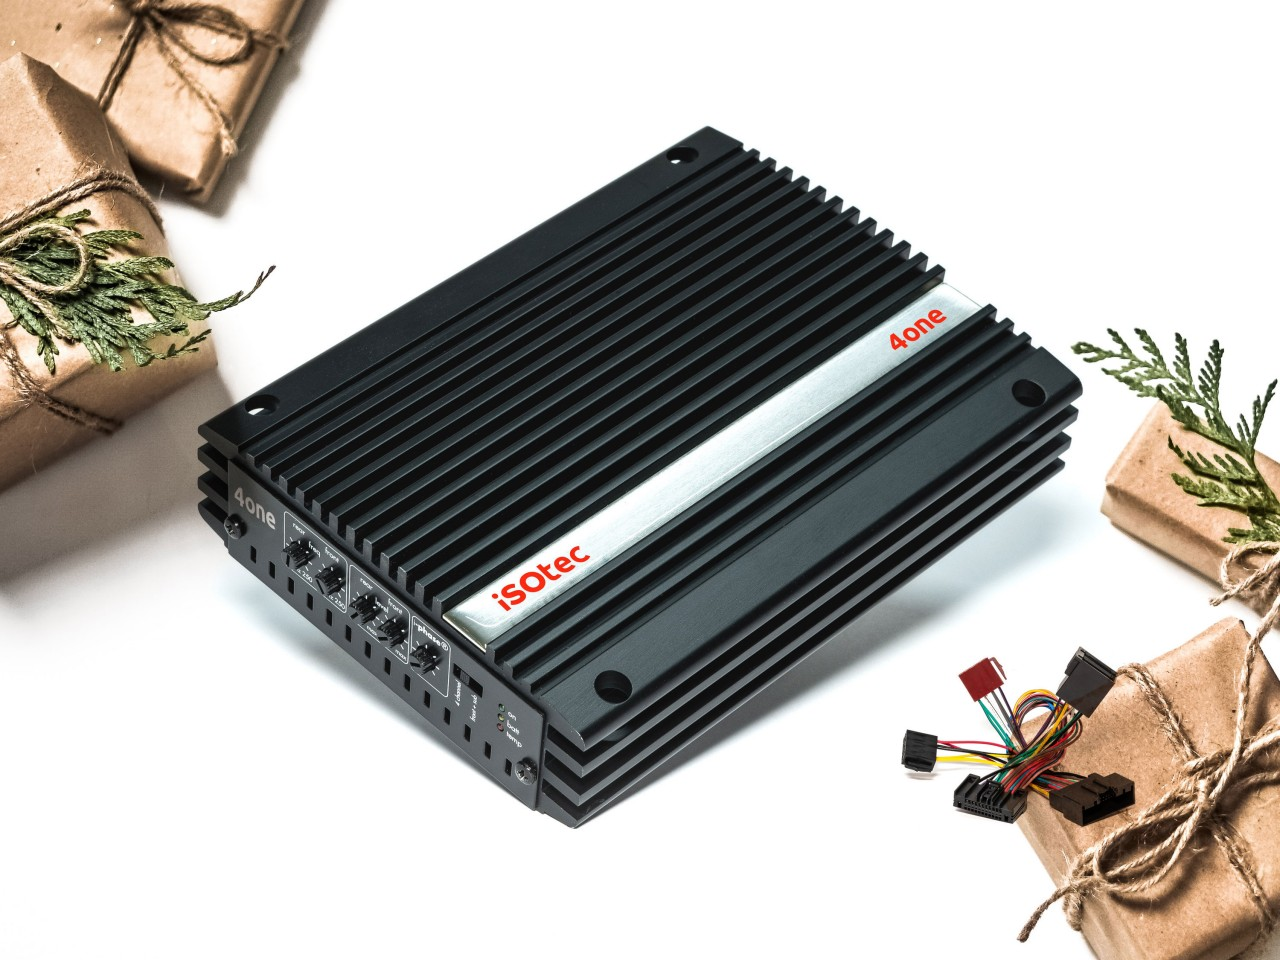 4one | Analog-Verstärker 320 Watt mit Radioadapter | plug & play